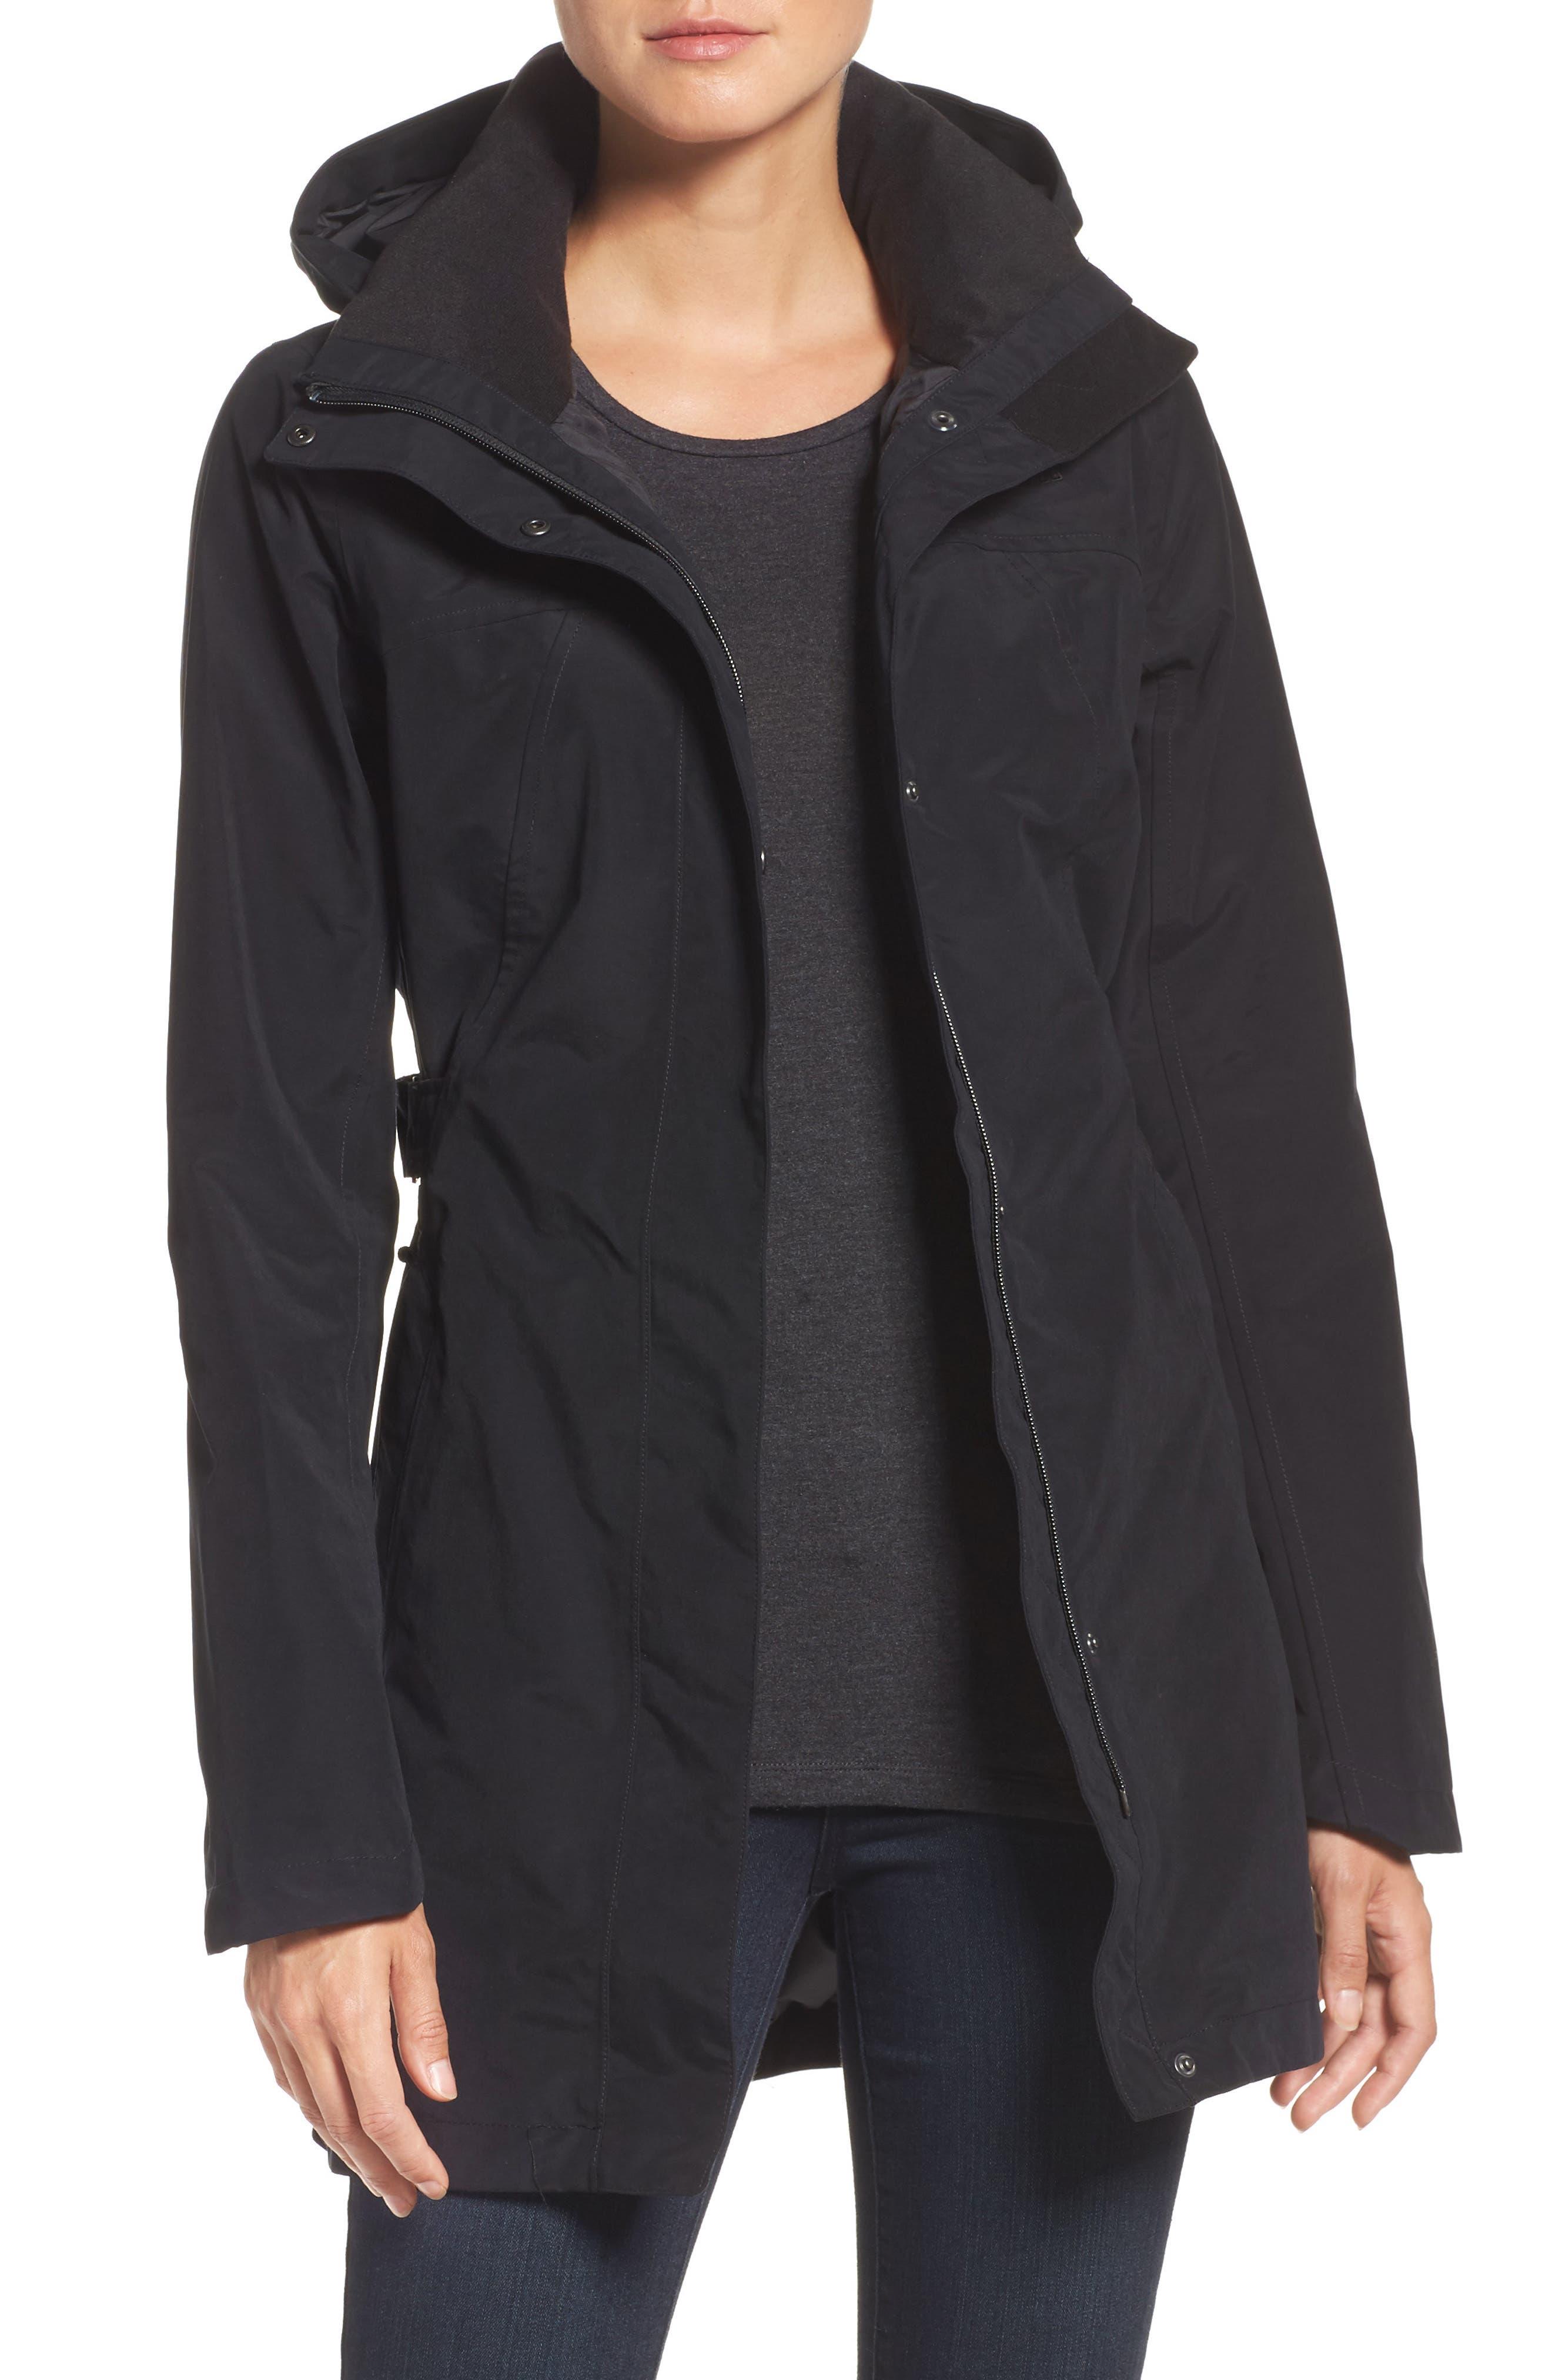 Laney II Trench Raincoat,                             Main thumbnail 1, color,                             Tnf Black